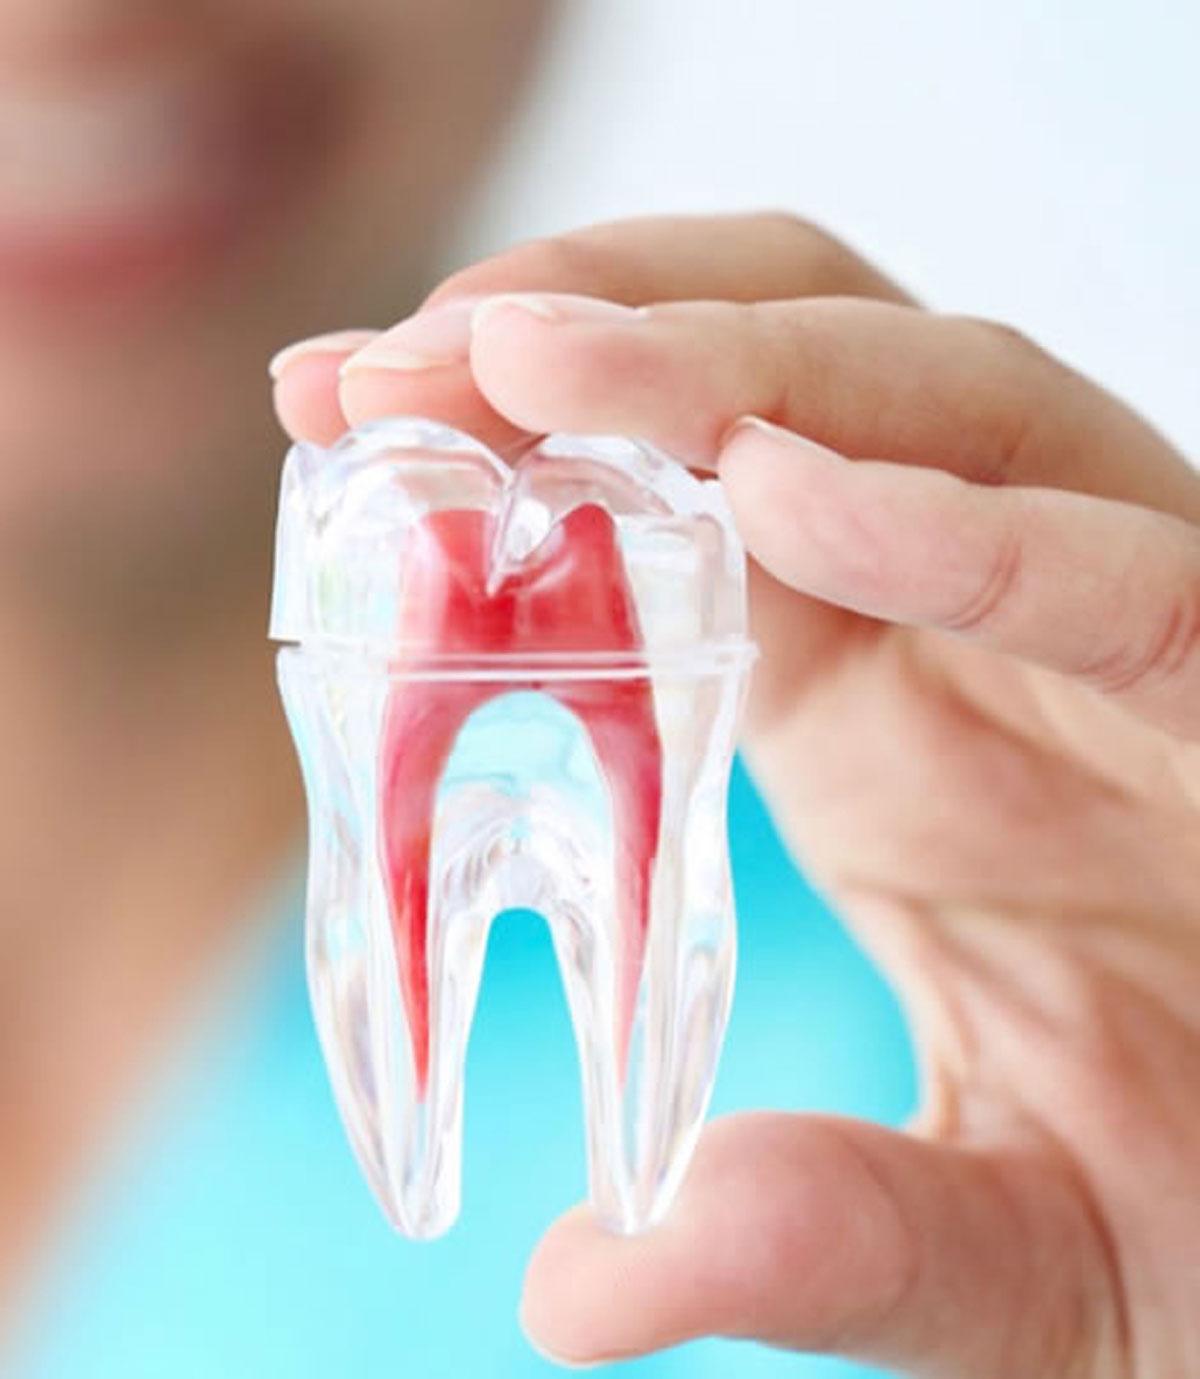 Tooth-1.jpg?fit=1200%2C1379&ssl=1